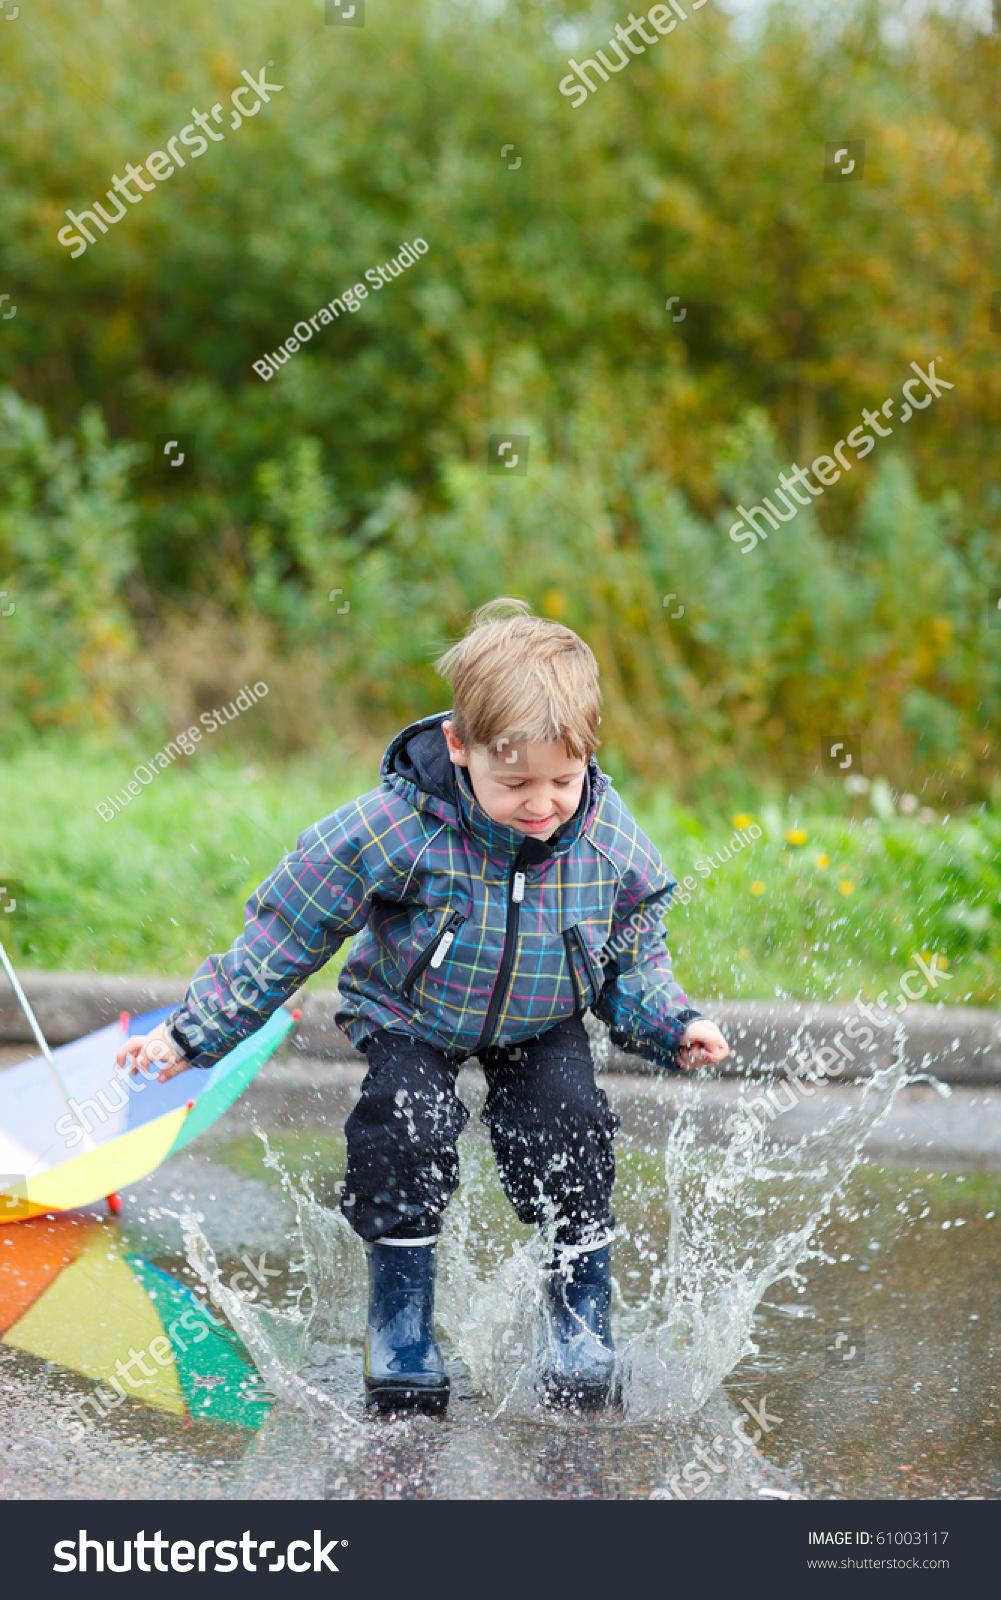 Playful puddles